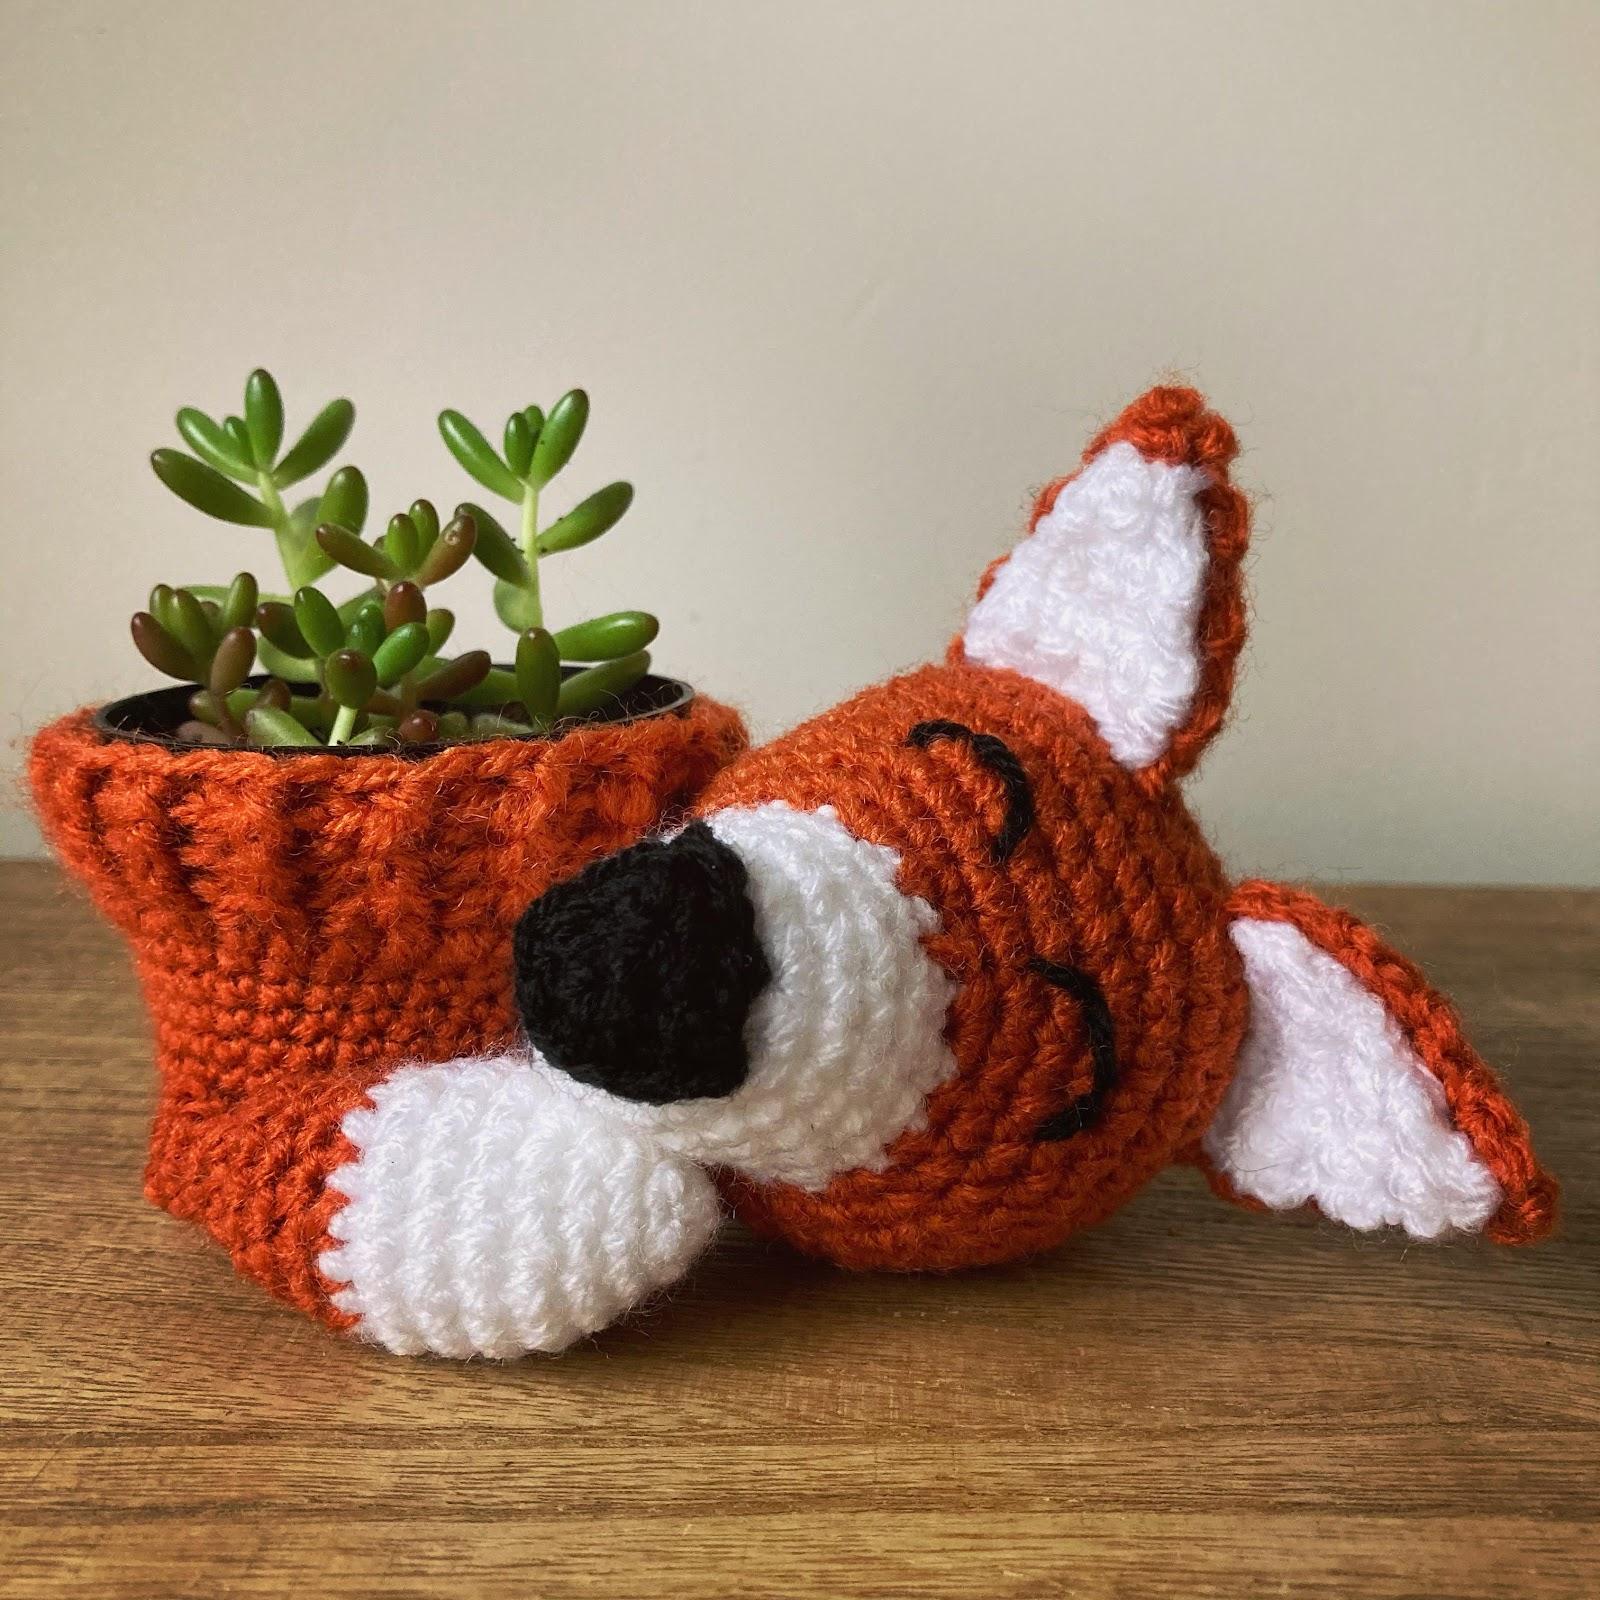 crochet Christmas gift idea - Sleepy Fox plant pot cover